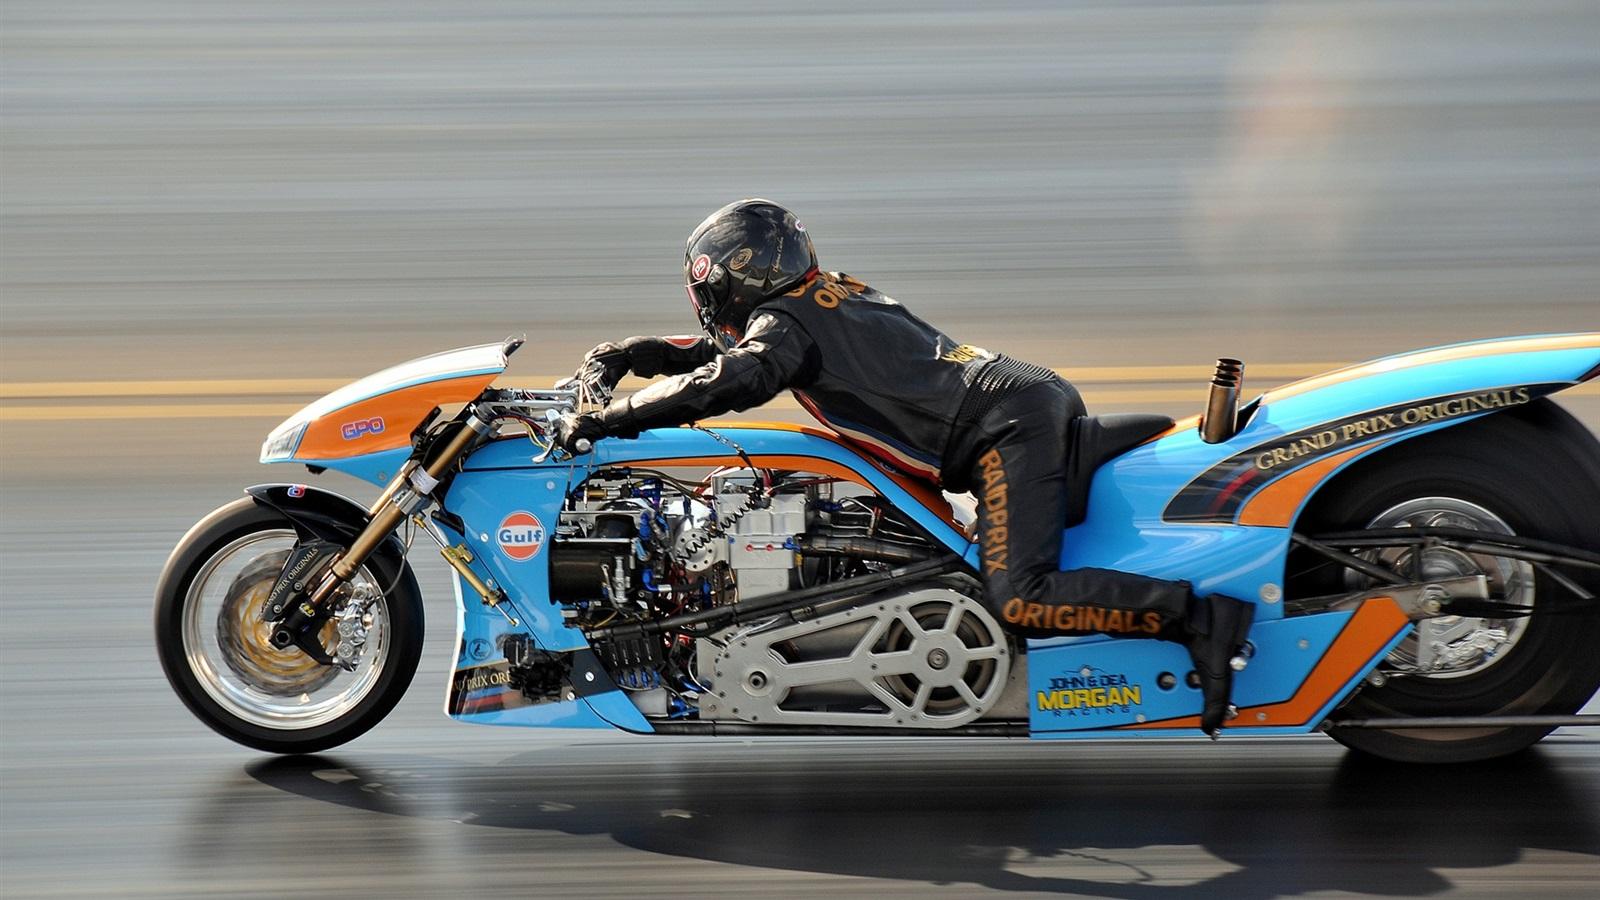 fonds d 39 cran moto vitesse courses de dragsters 1920x1200 hd image. Black Bedroom Furniture Sets. Home Design Ideas